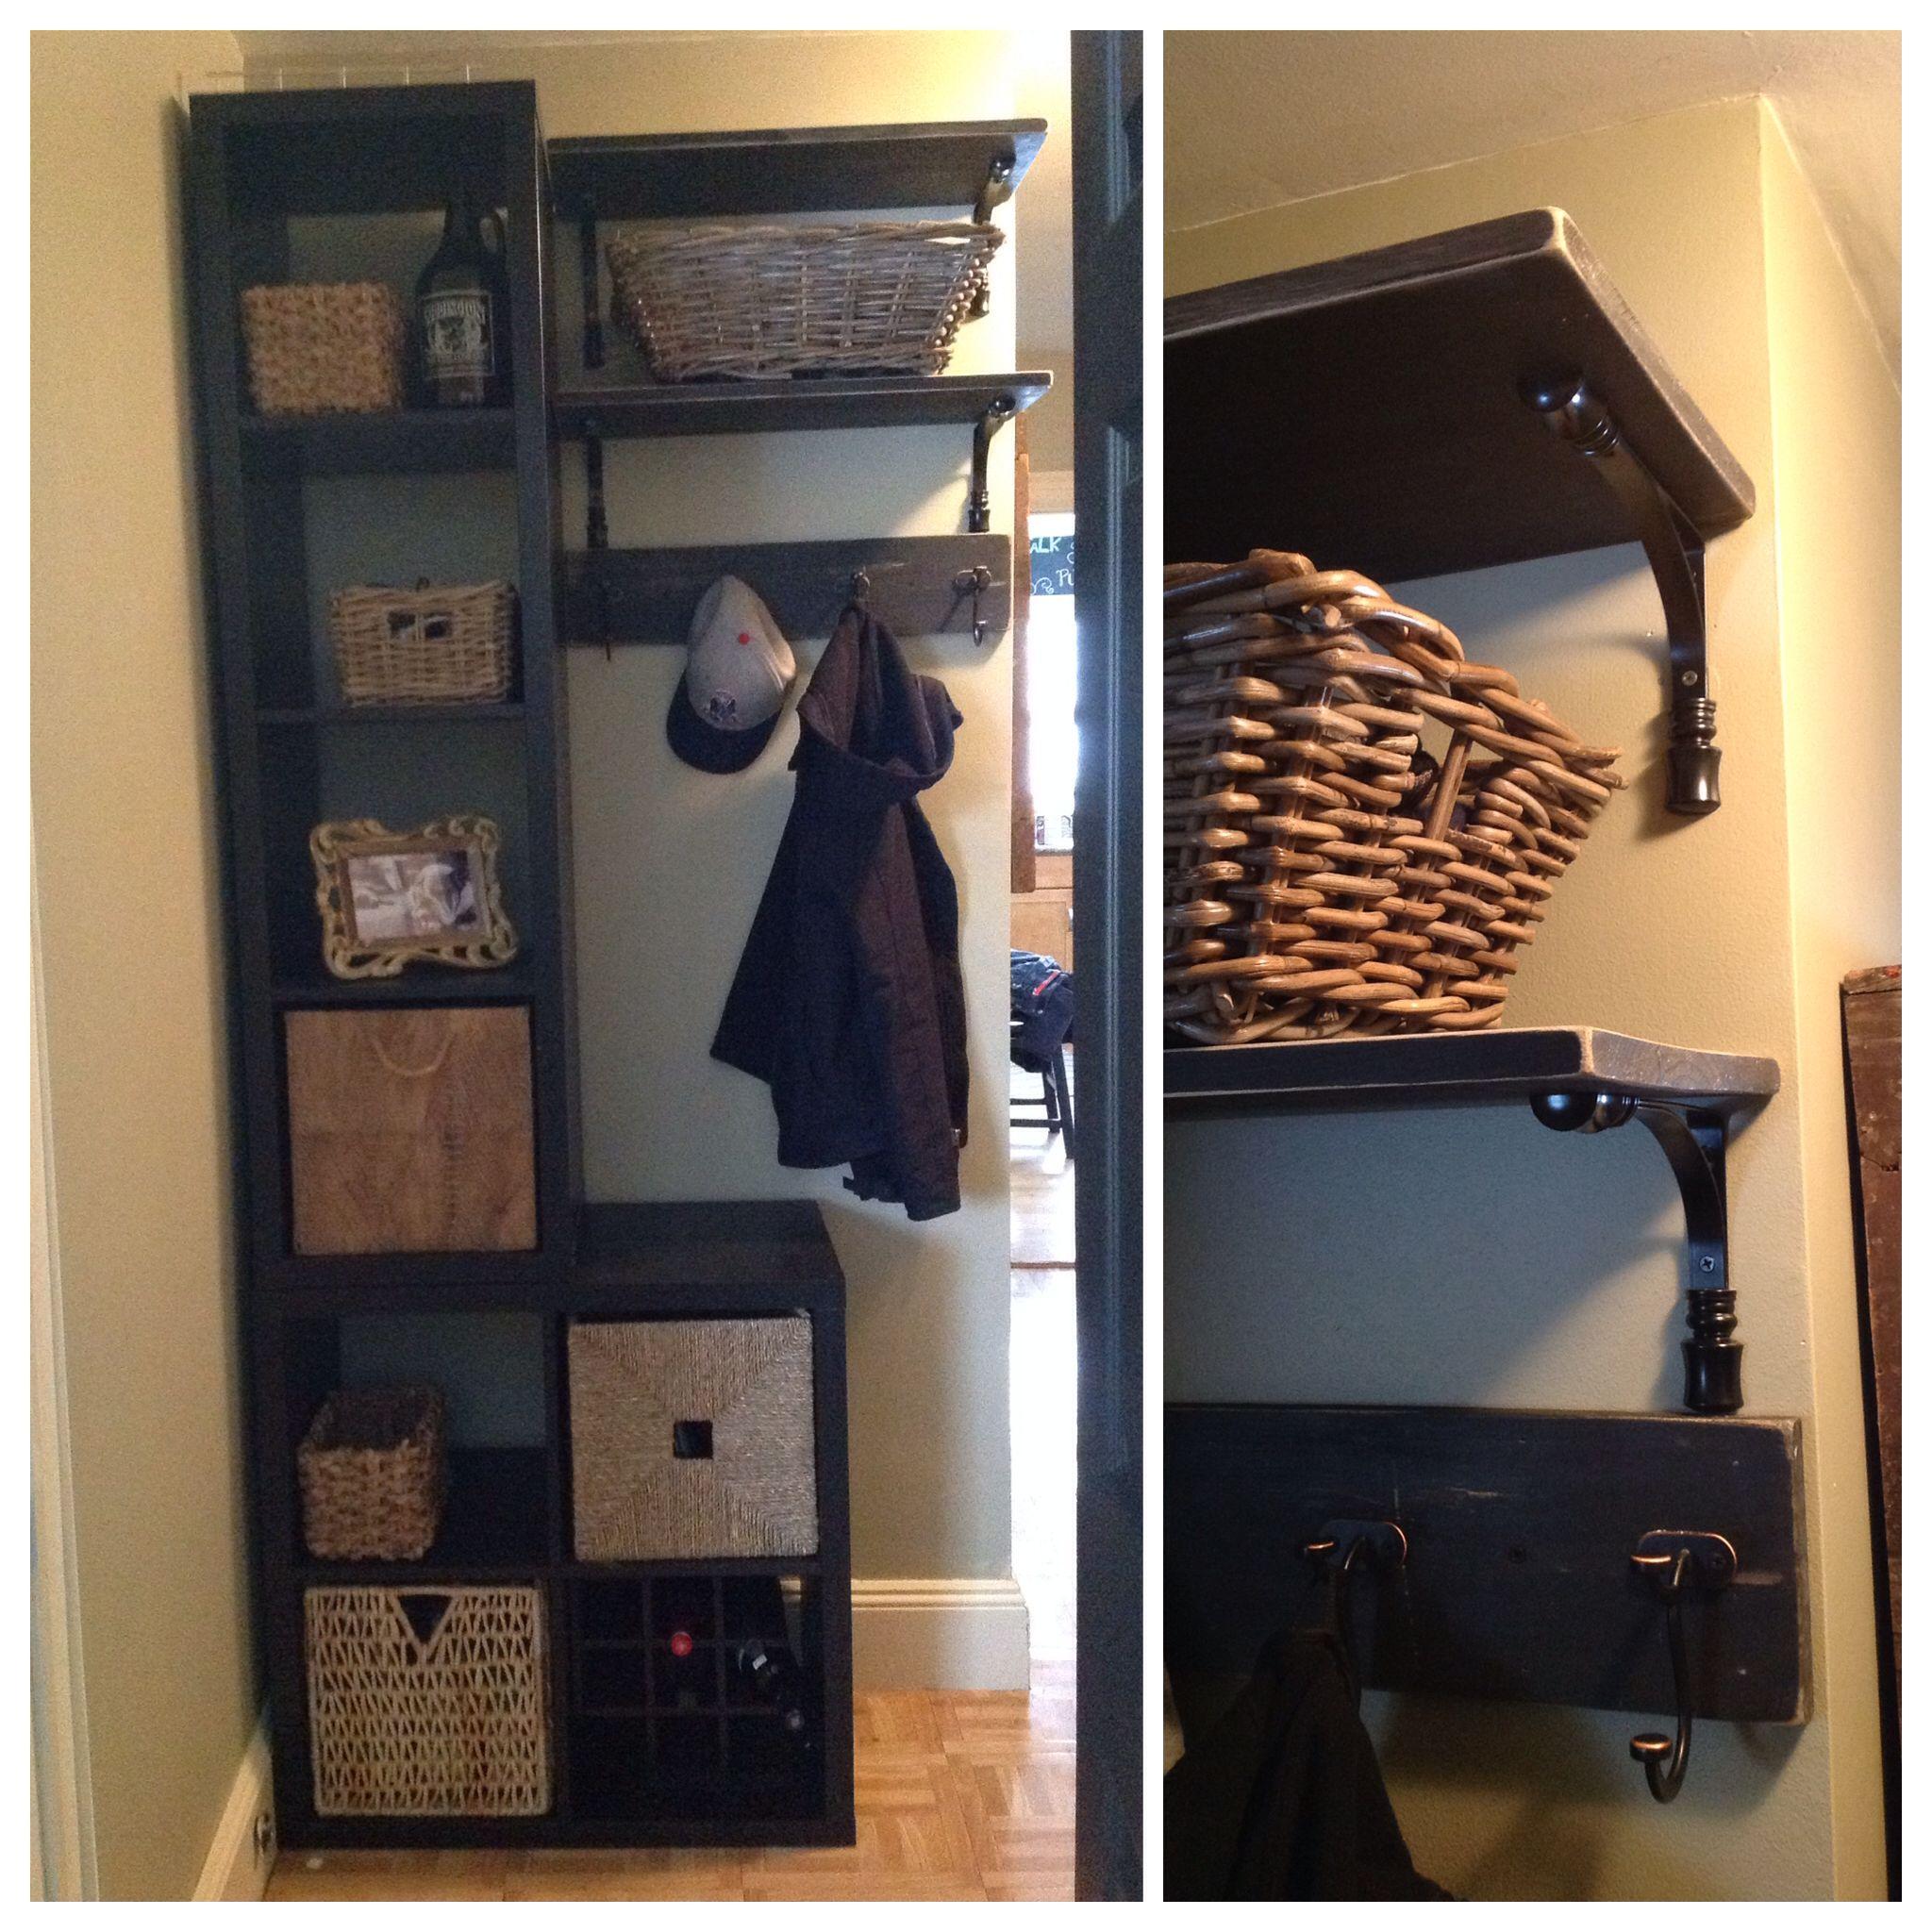 create storage 2 ikea kallax shelving unit 2x2. Black Bedroom Furniture Sets. Home Design Ideas